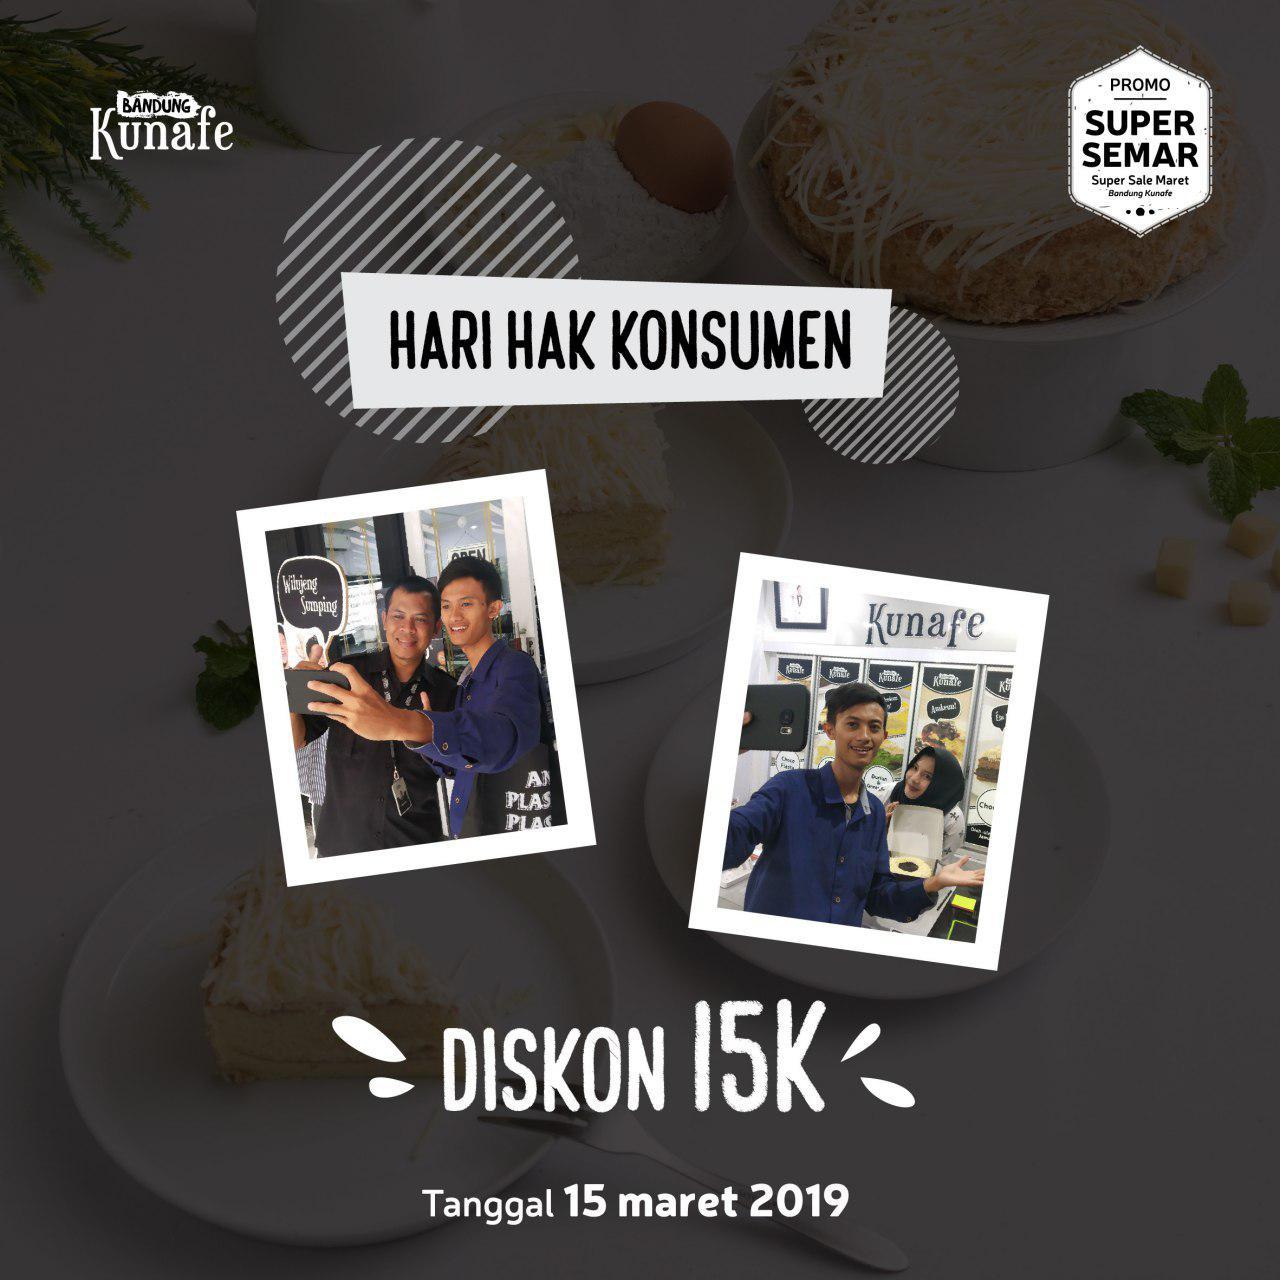 Promo Hari Hak Konsumen Bandung Kunafe